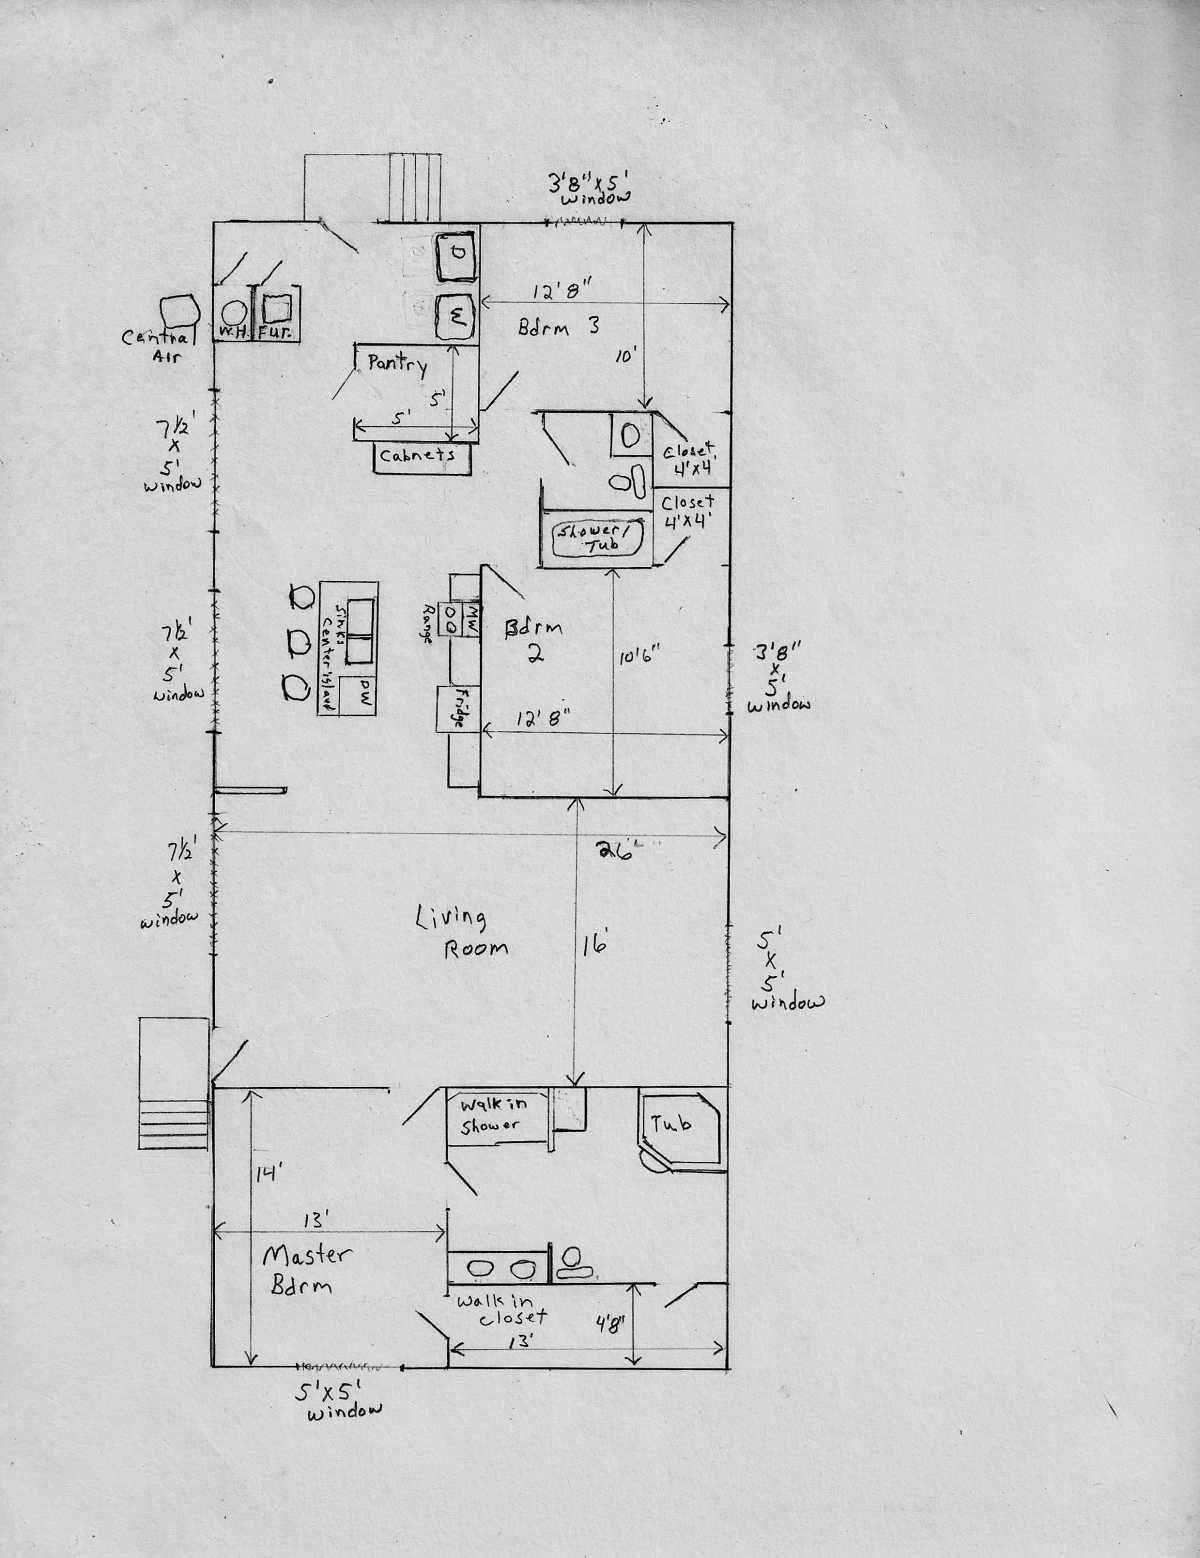 Photo 1999 redman mobile home floor plans images photo for 28x48 floor plans